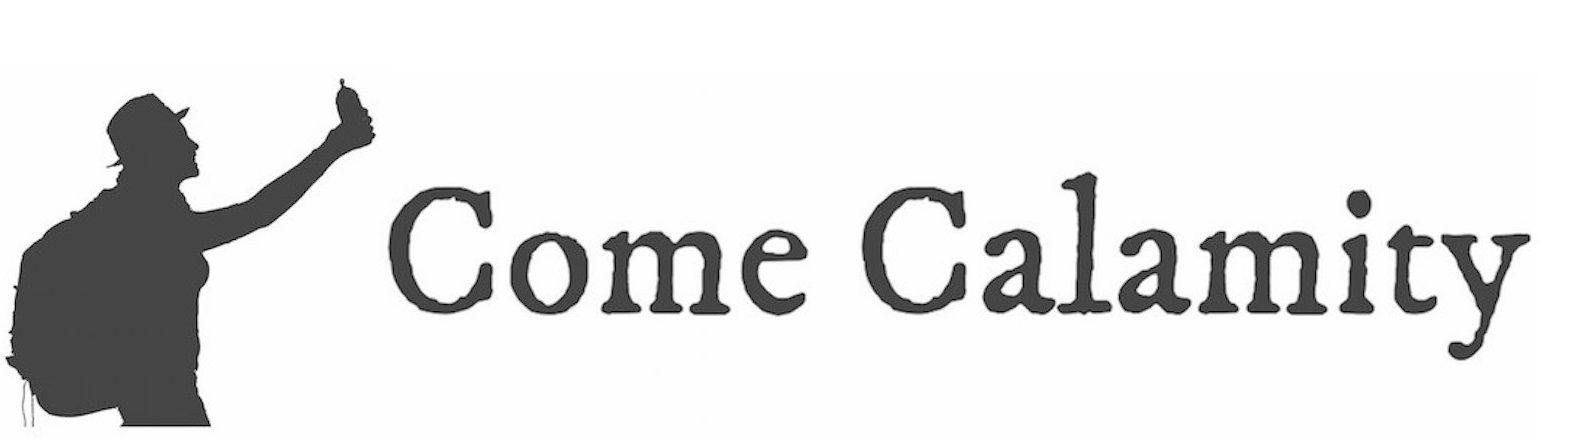 Come Calamity